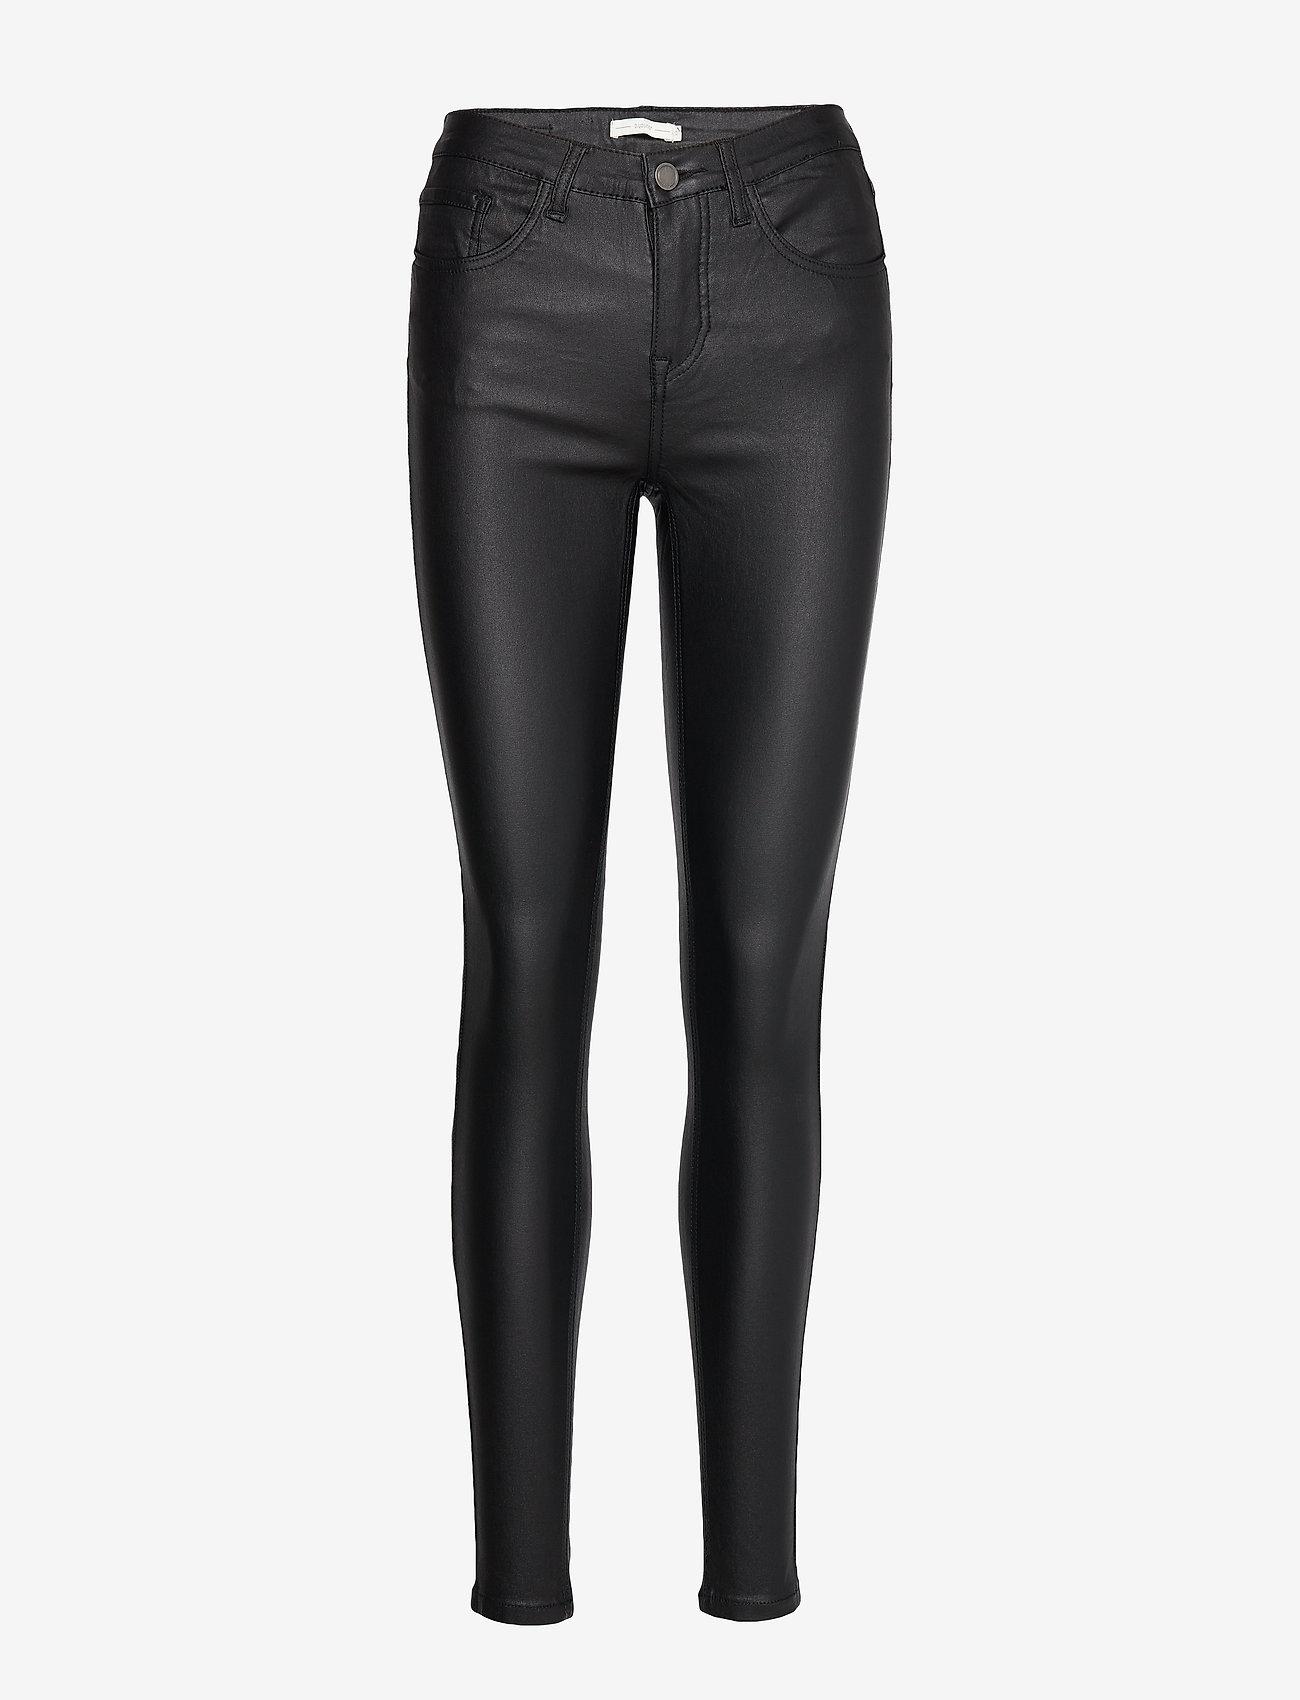 b.young - Kato Kiko jeans - - skinny jeans - black - 0